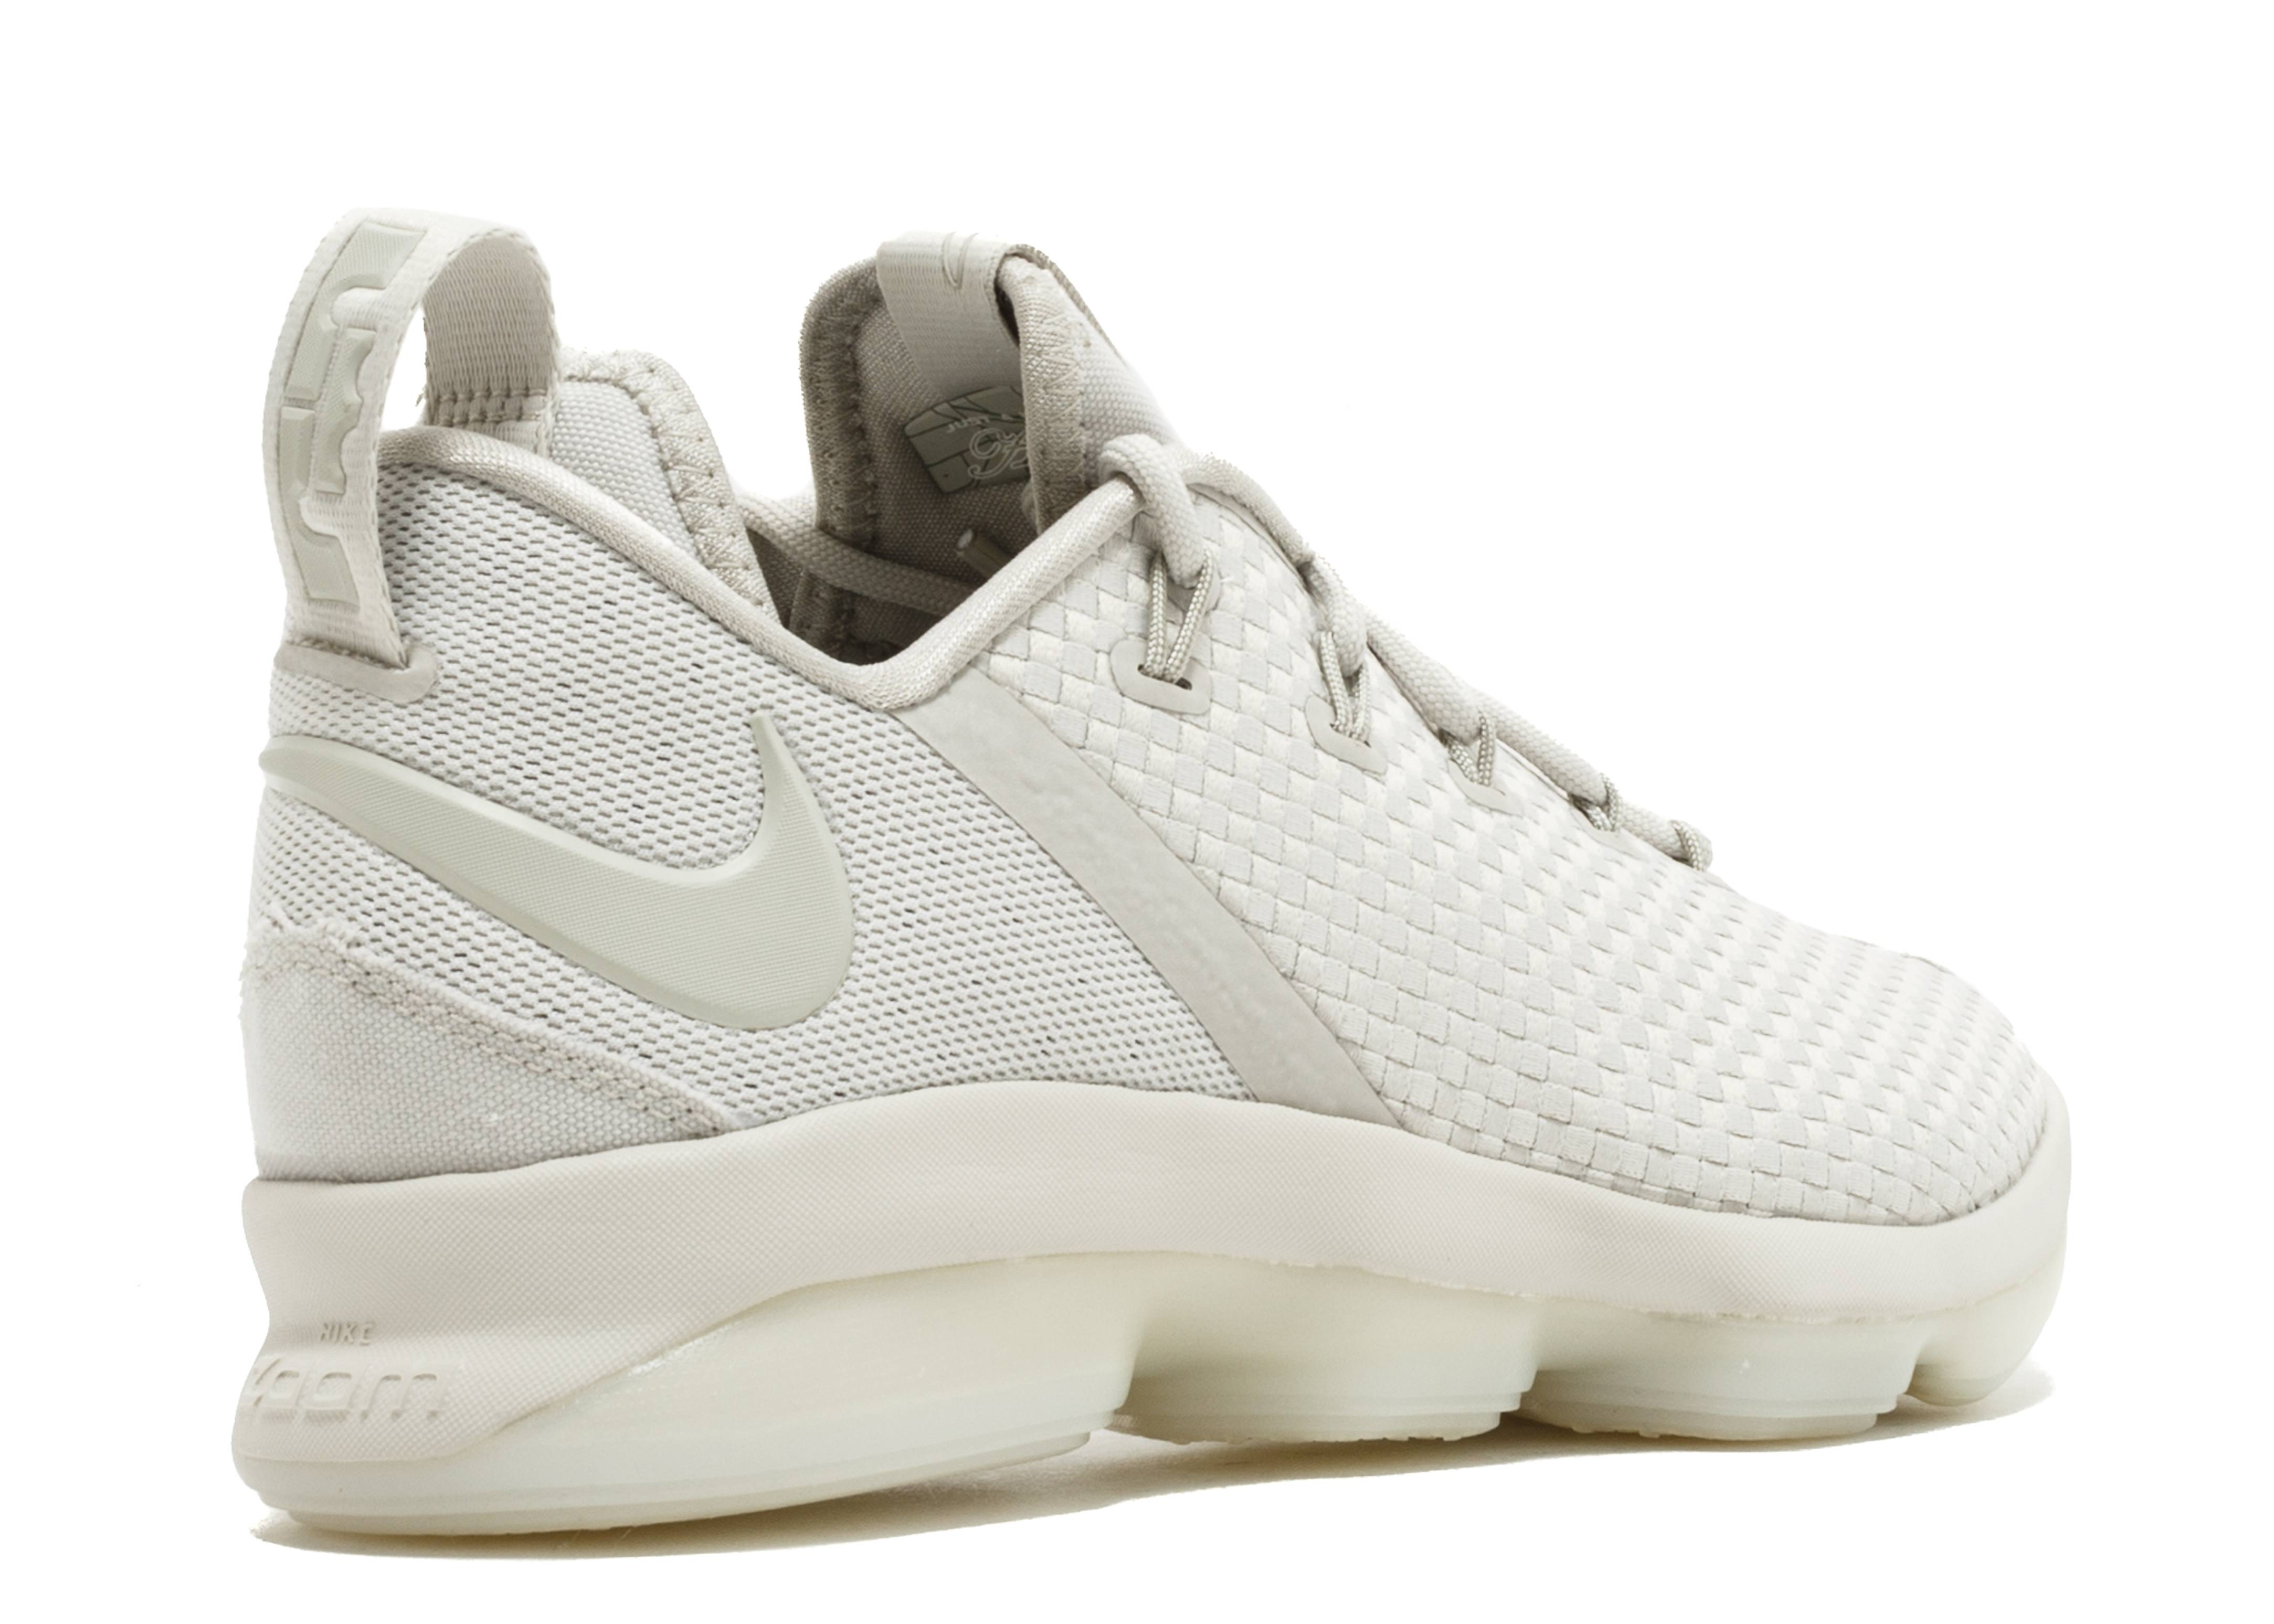 Lebron XIV Low - Nike - 878636 004 - light bone ivory-light bone ... c170a79bb